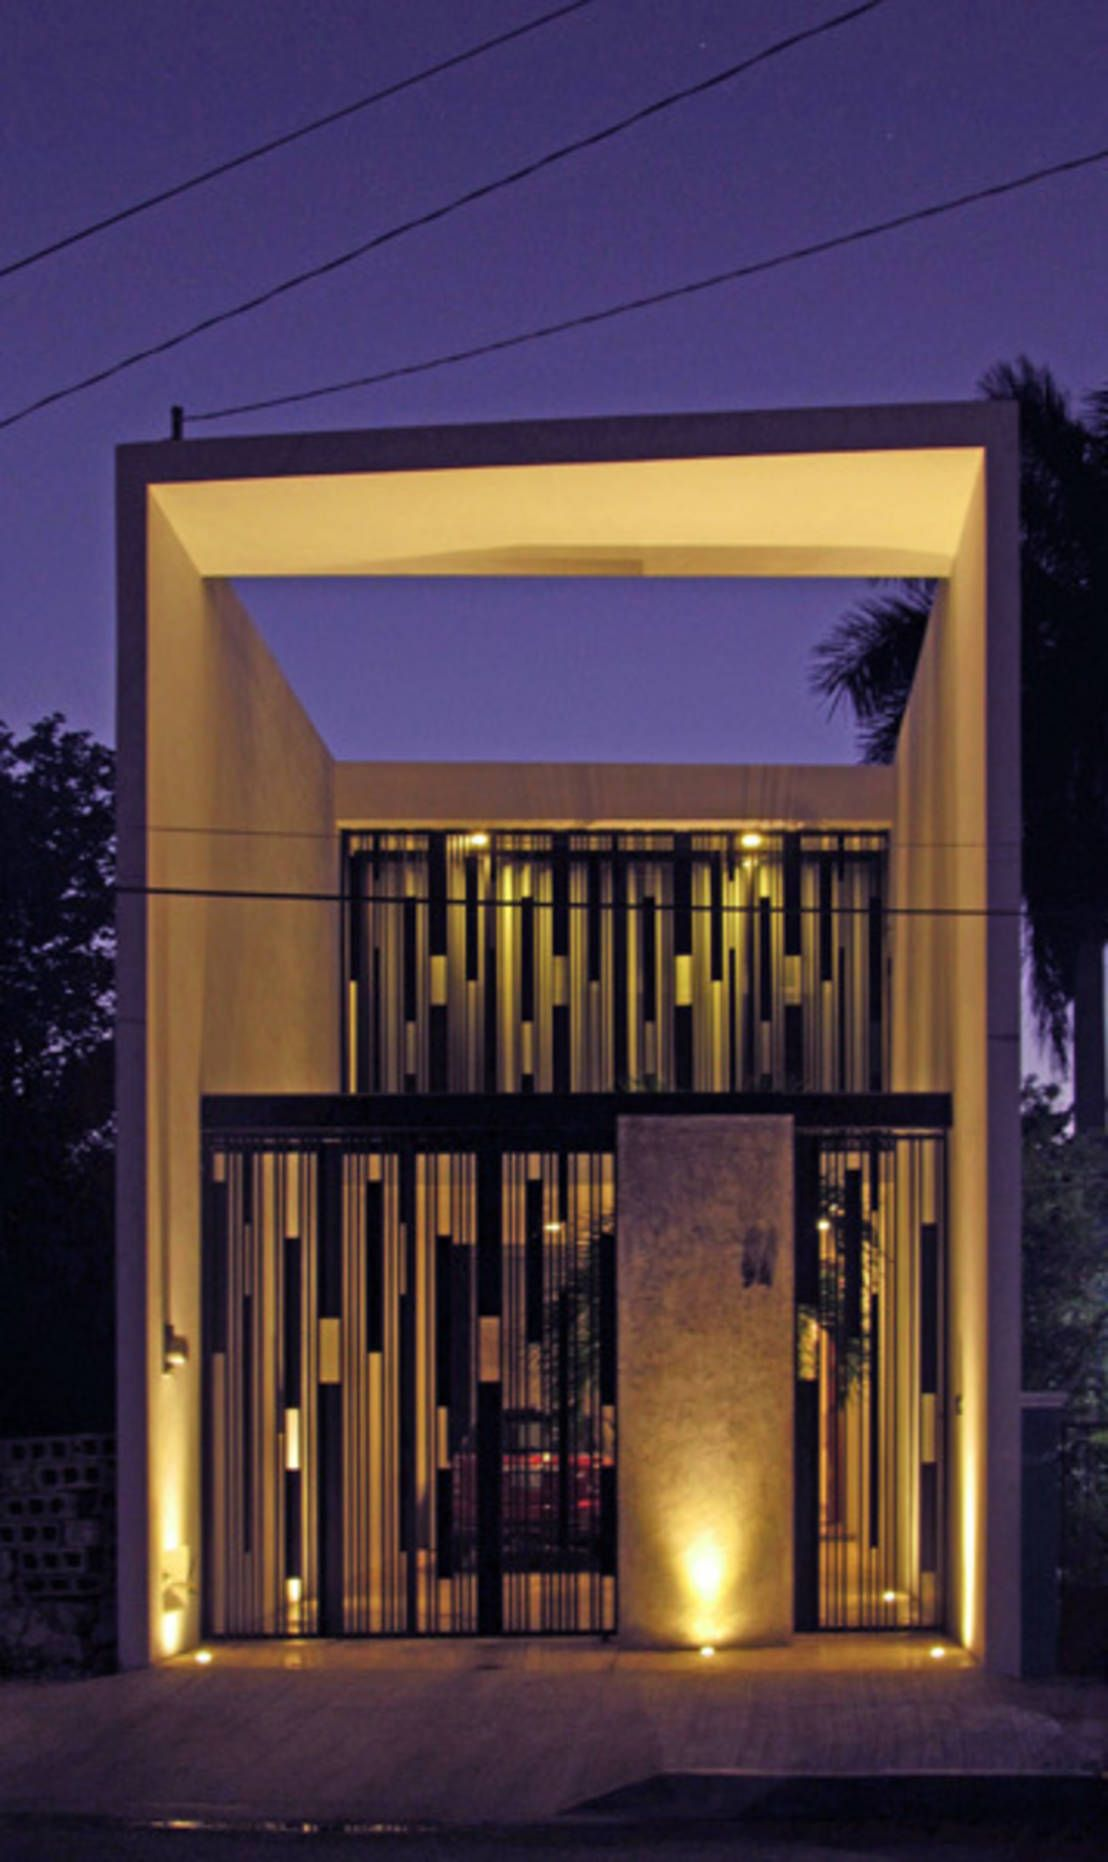 Casas peque as 8 fachadas sensacionales fachadas for Viviendas minimalistas pequenas